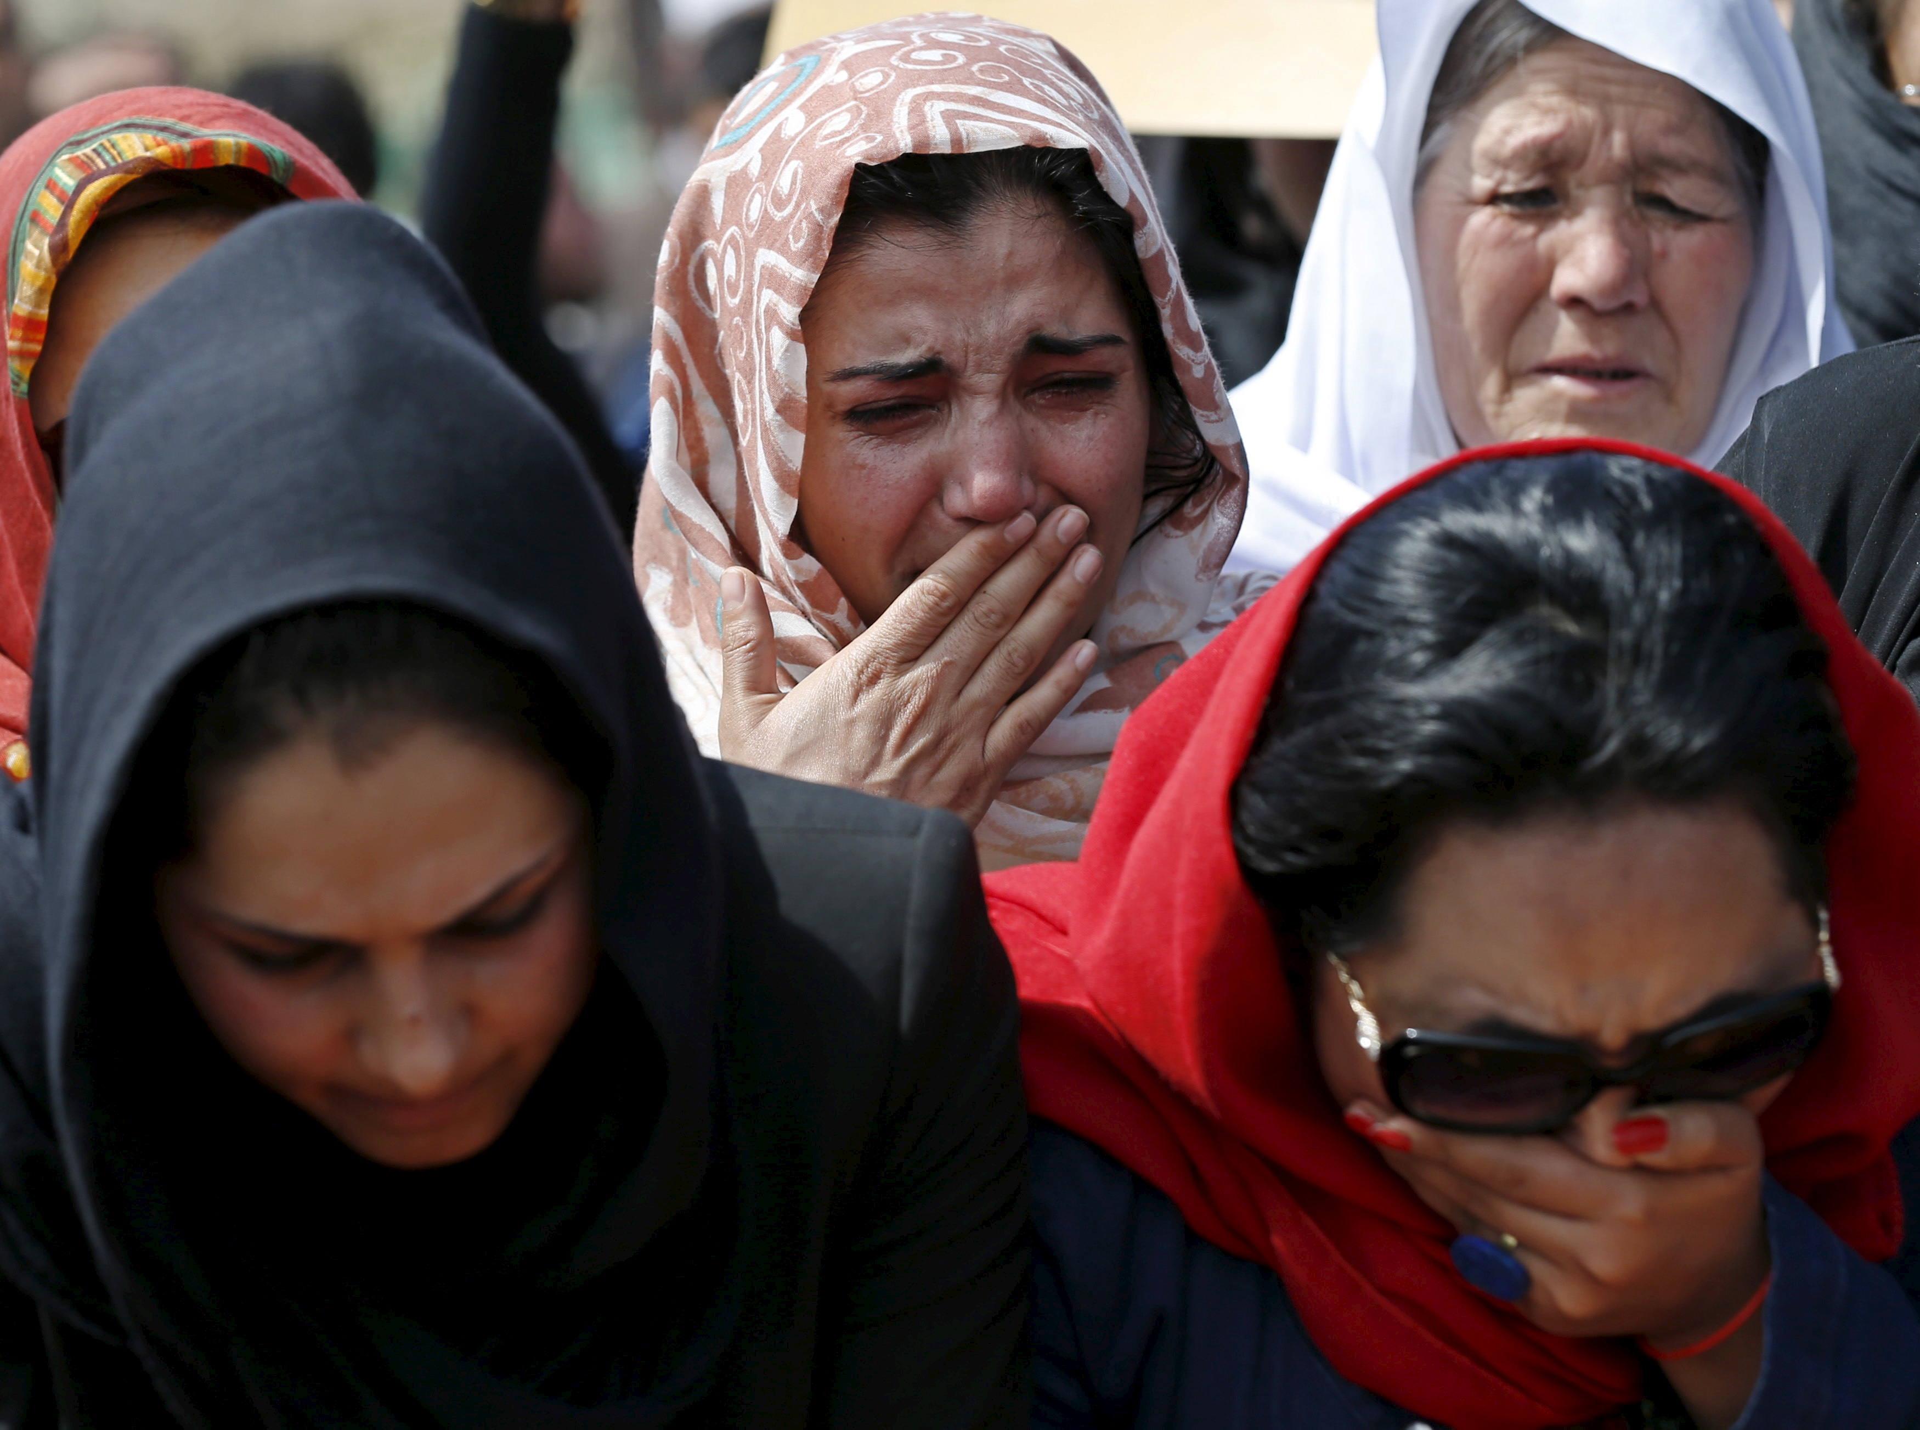 afghan women revealed 10 name : vida samadzai real name : vida samadzai dob : february 22, 1978 pob : khost province, afghanistan profession : an afghan.